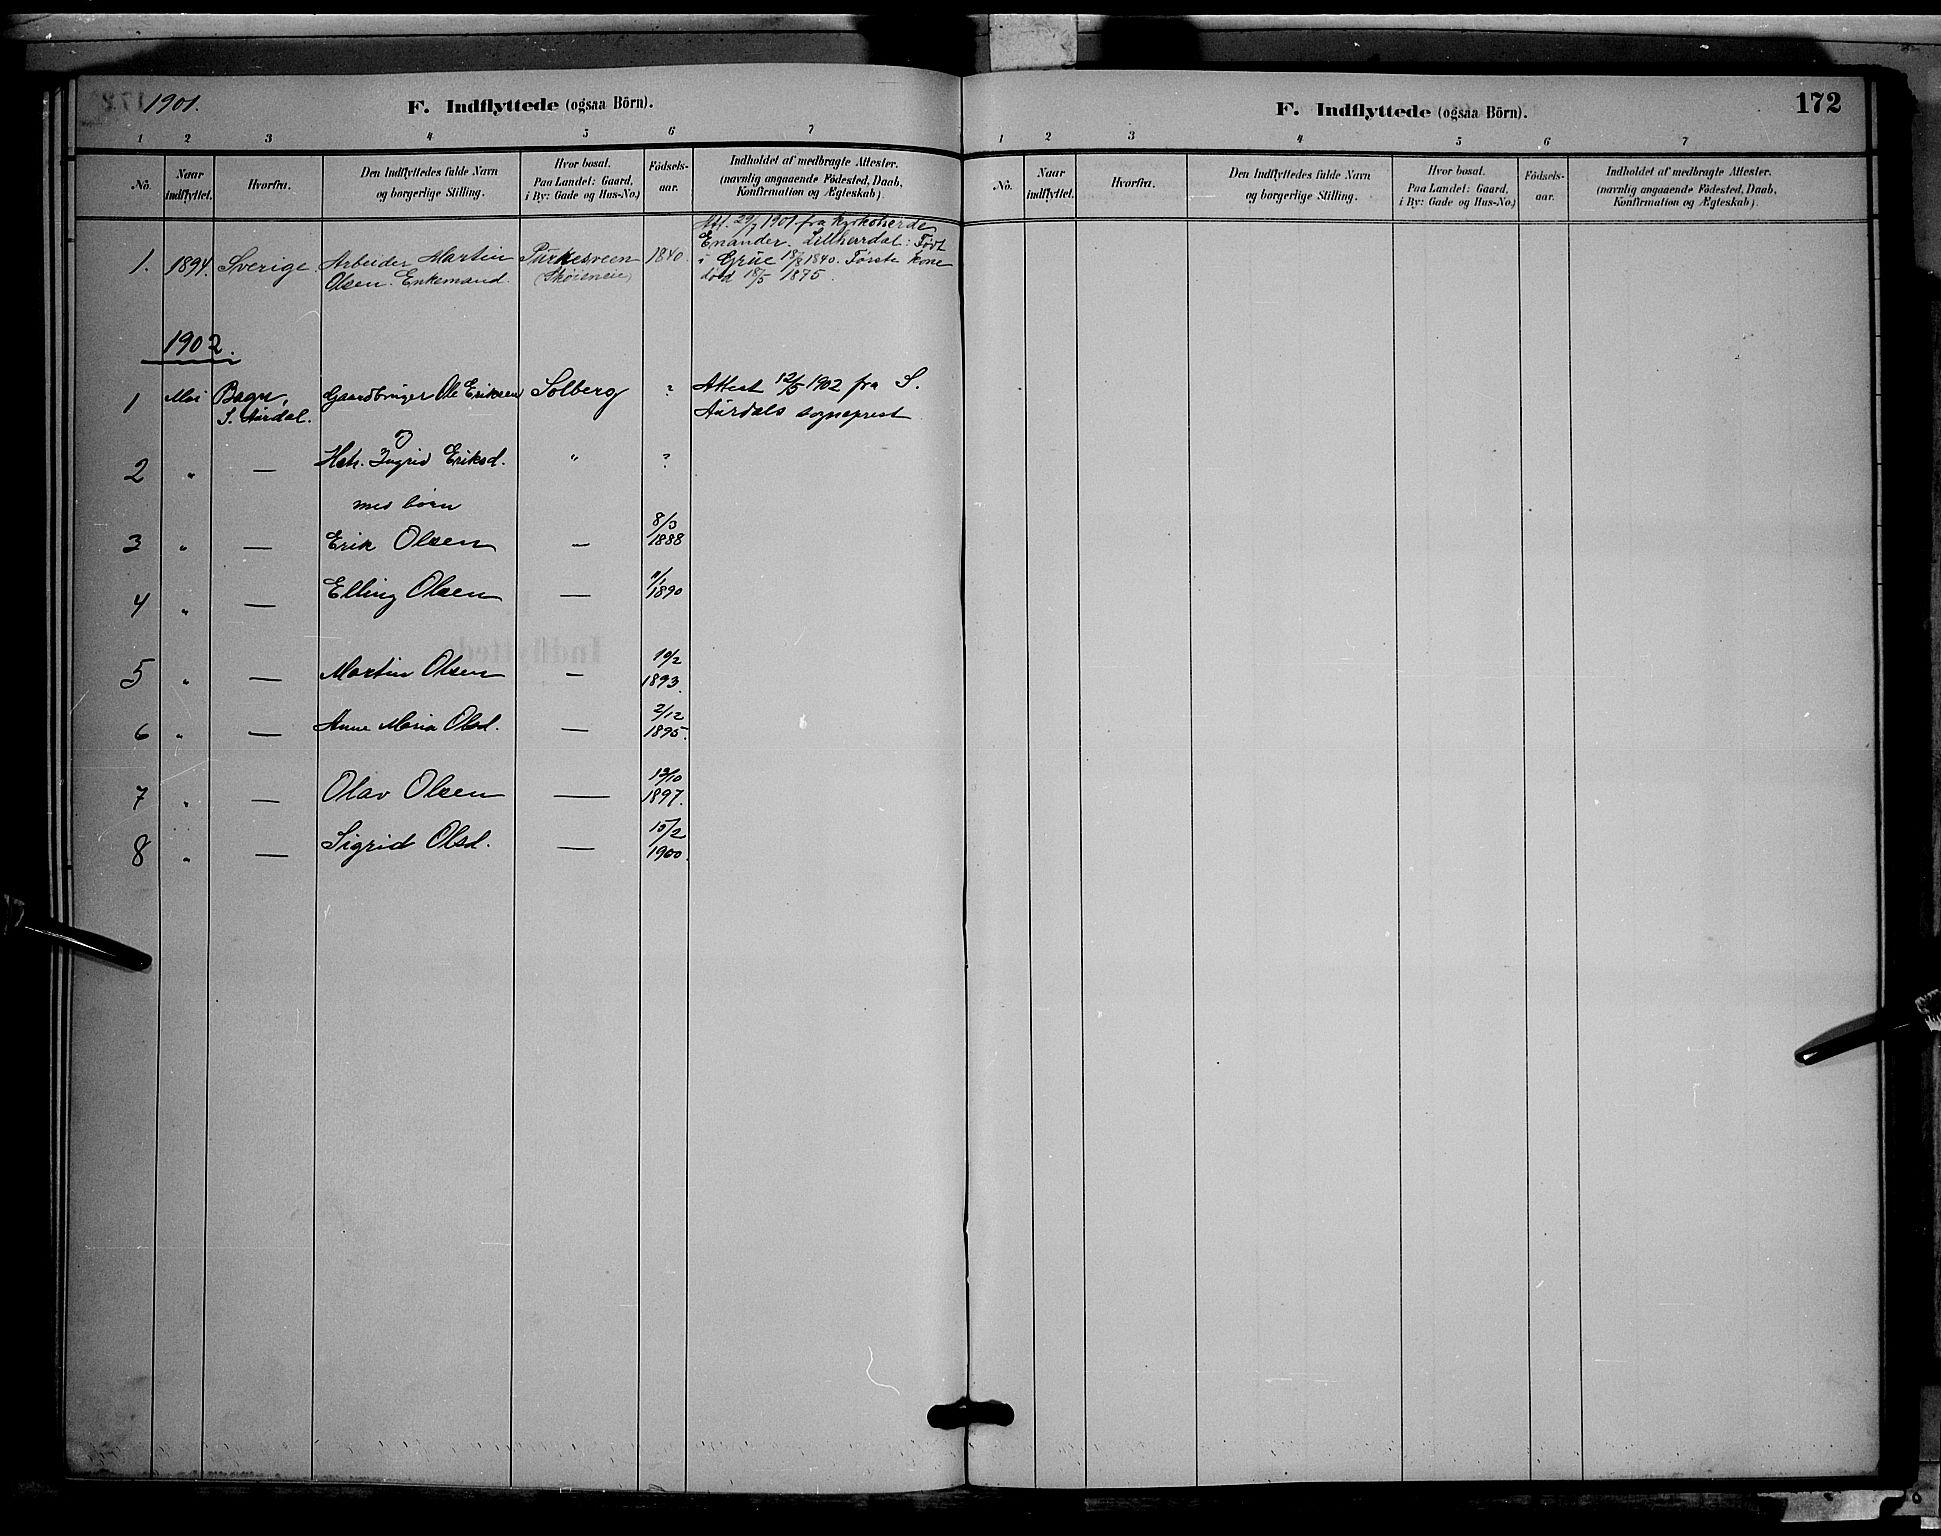 SAH, Søndre Land prestekontor, L/L0003: Klokkerbok nr. 3, 1884-1902, s. 172